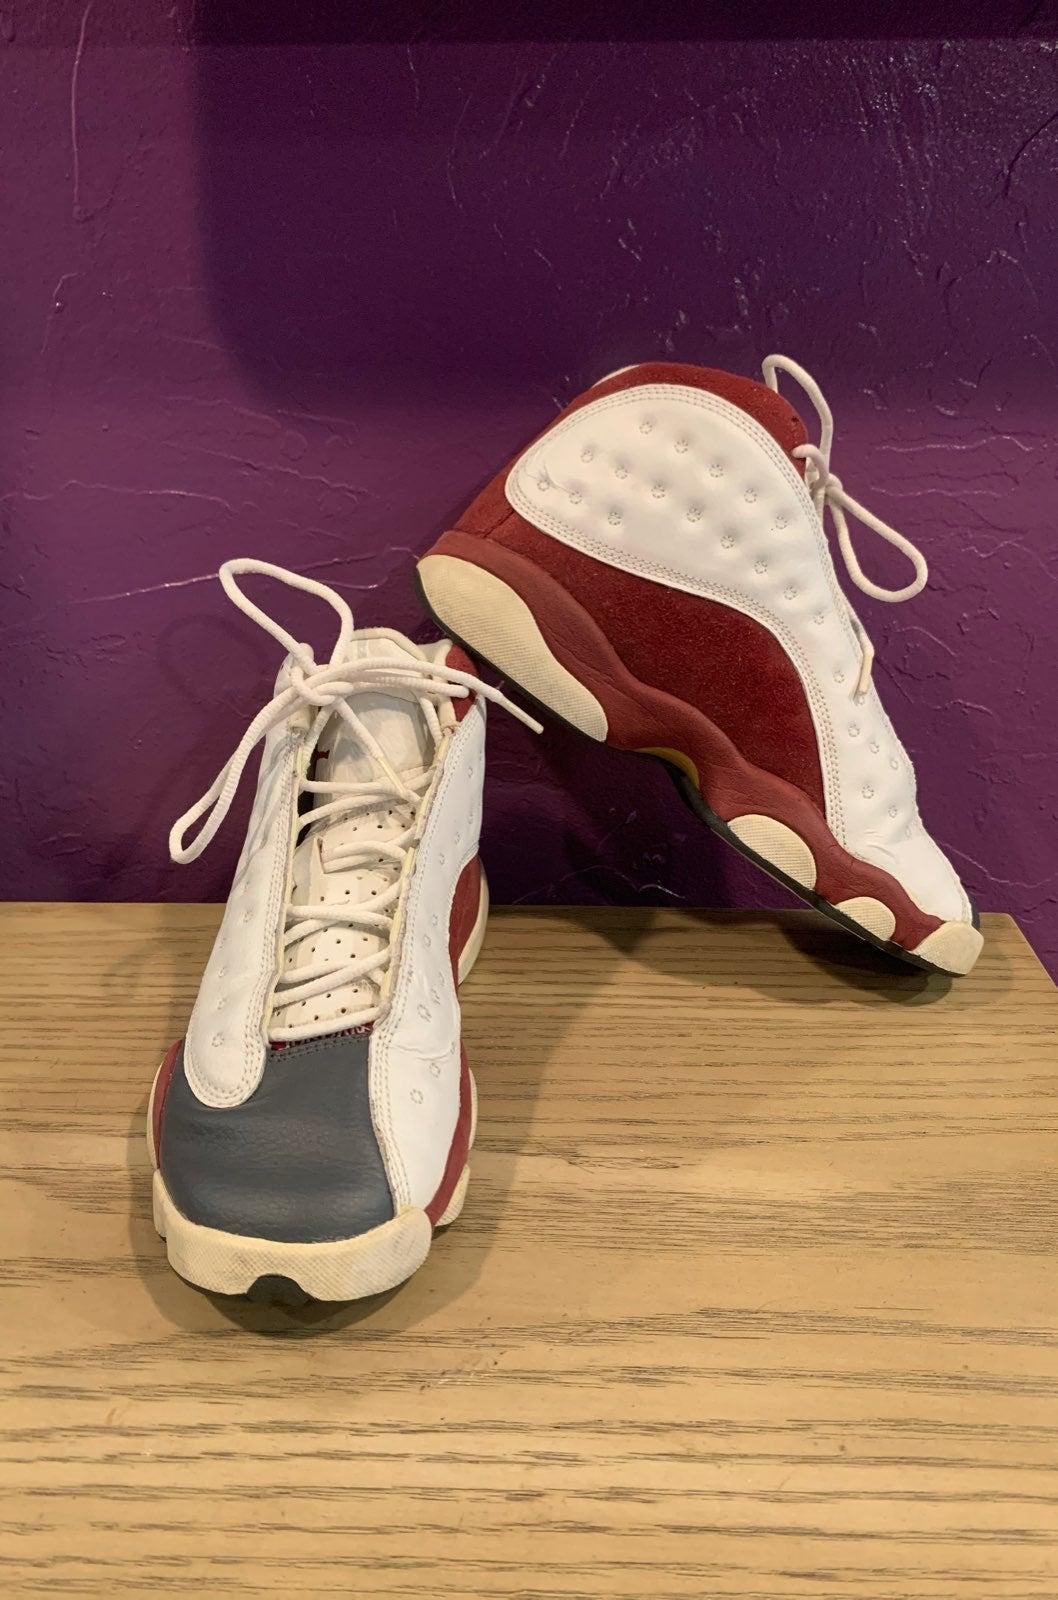 Air Jordan Retro 13s Size 5.5y Burgundy